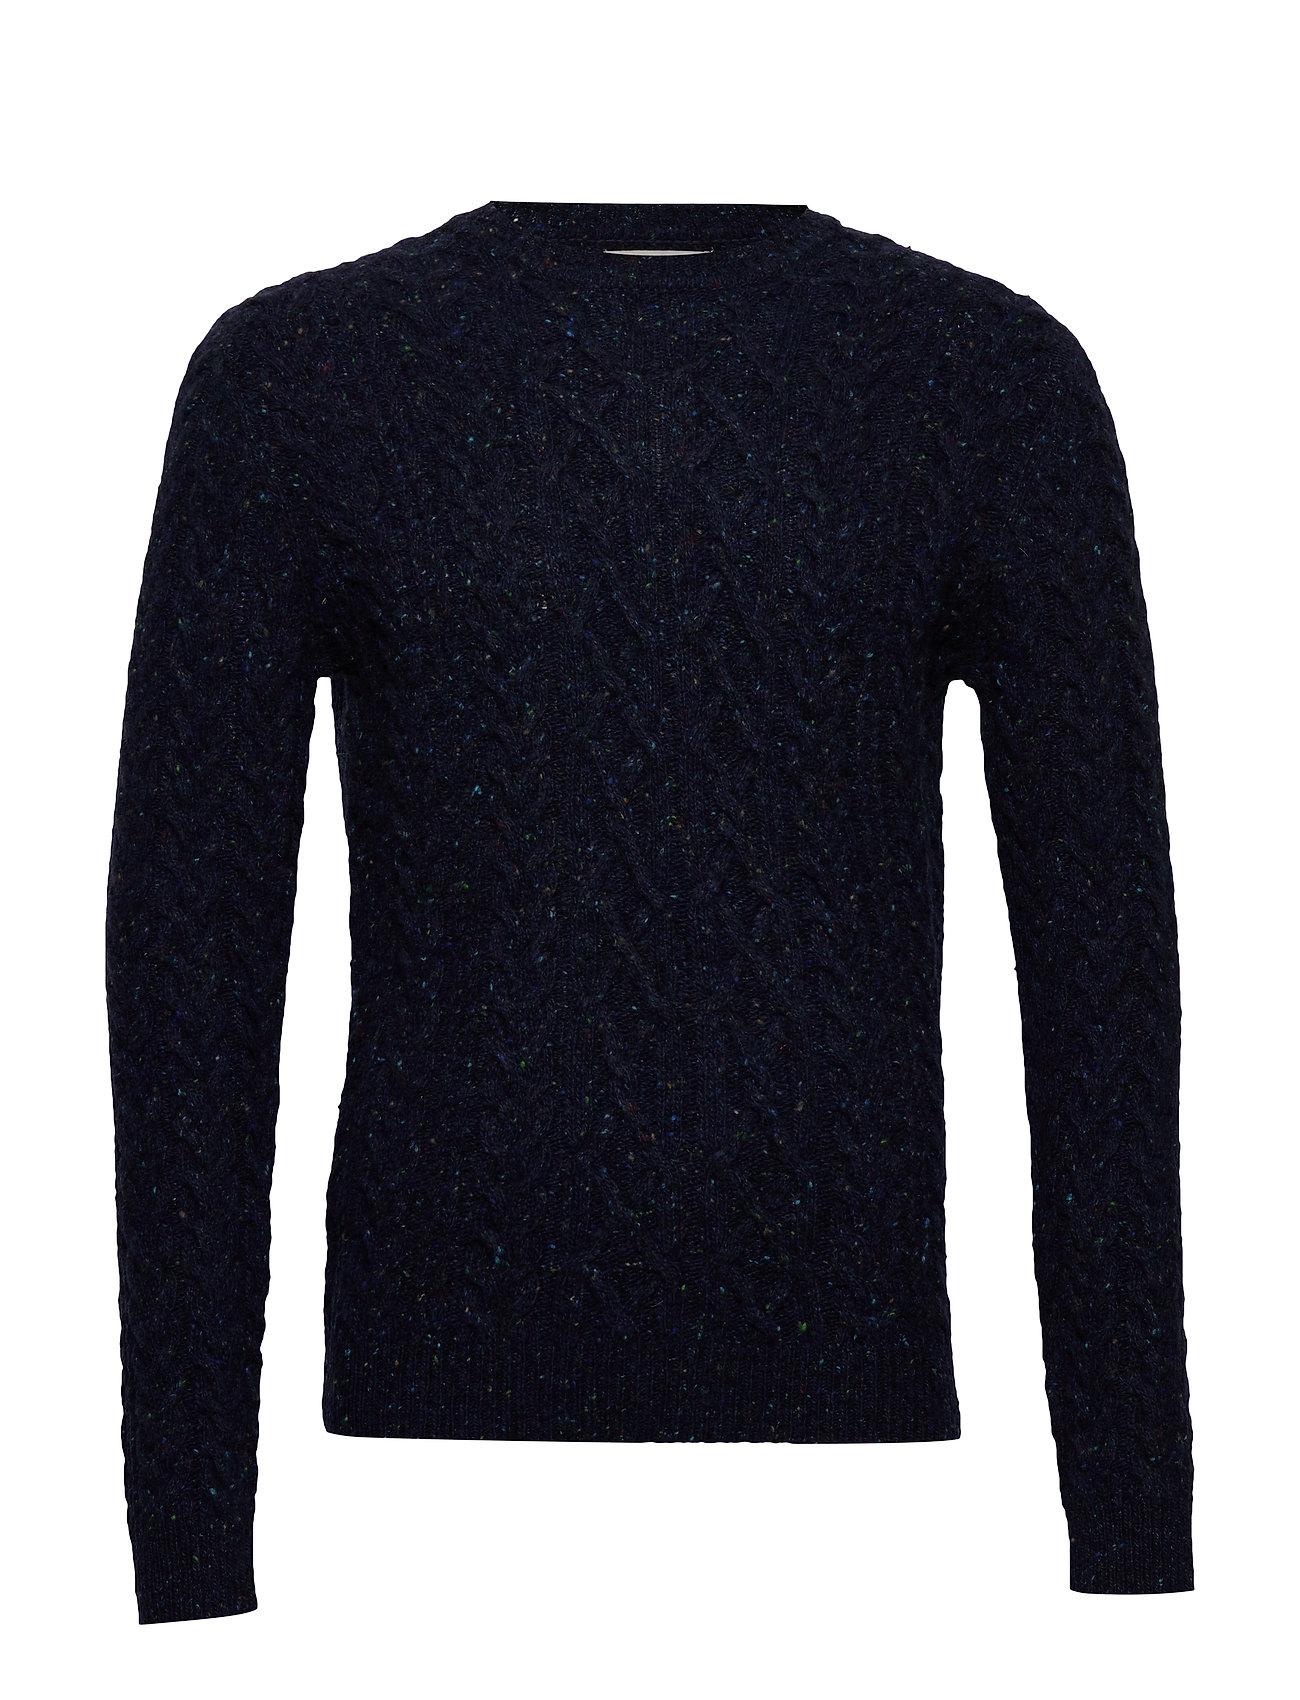 Mango Man Neps braided wool sweater - NAVY